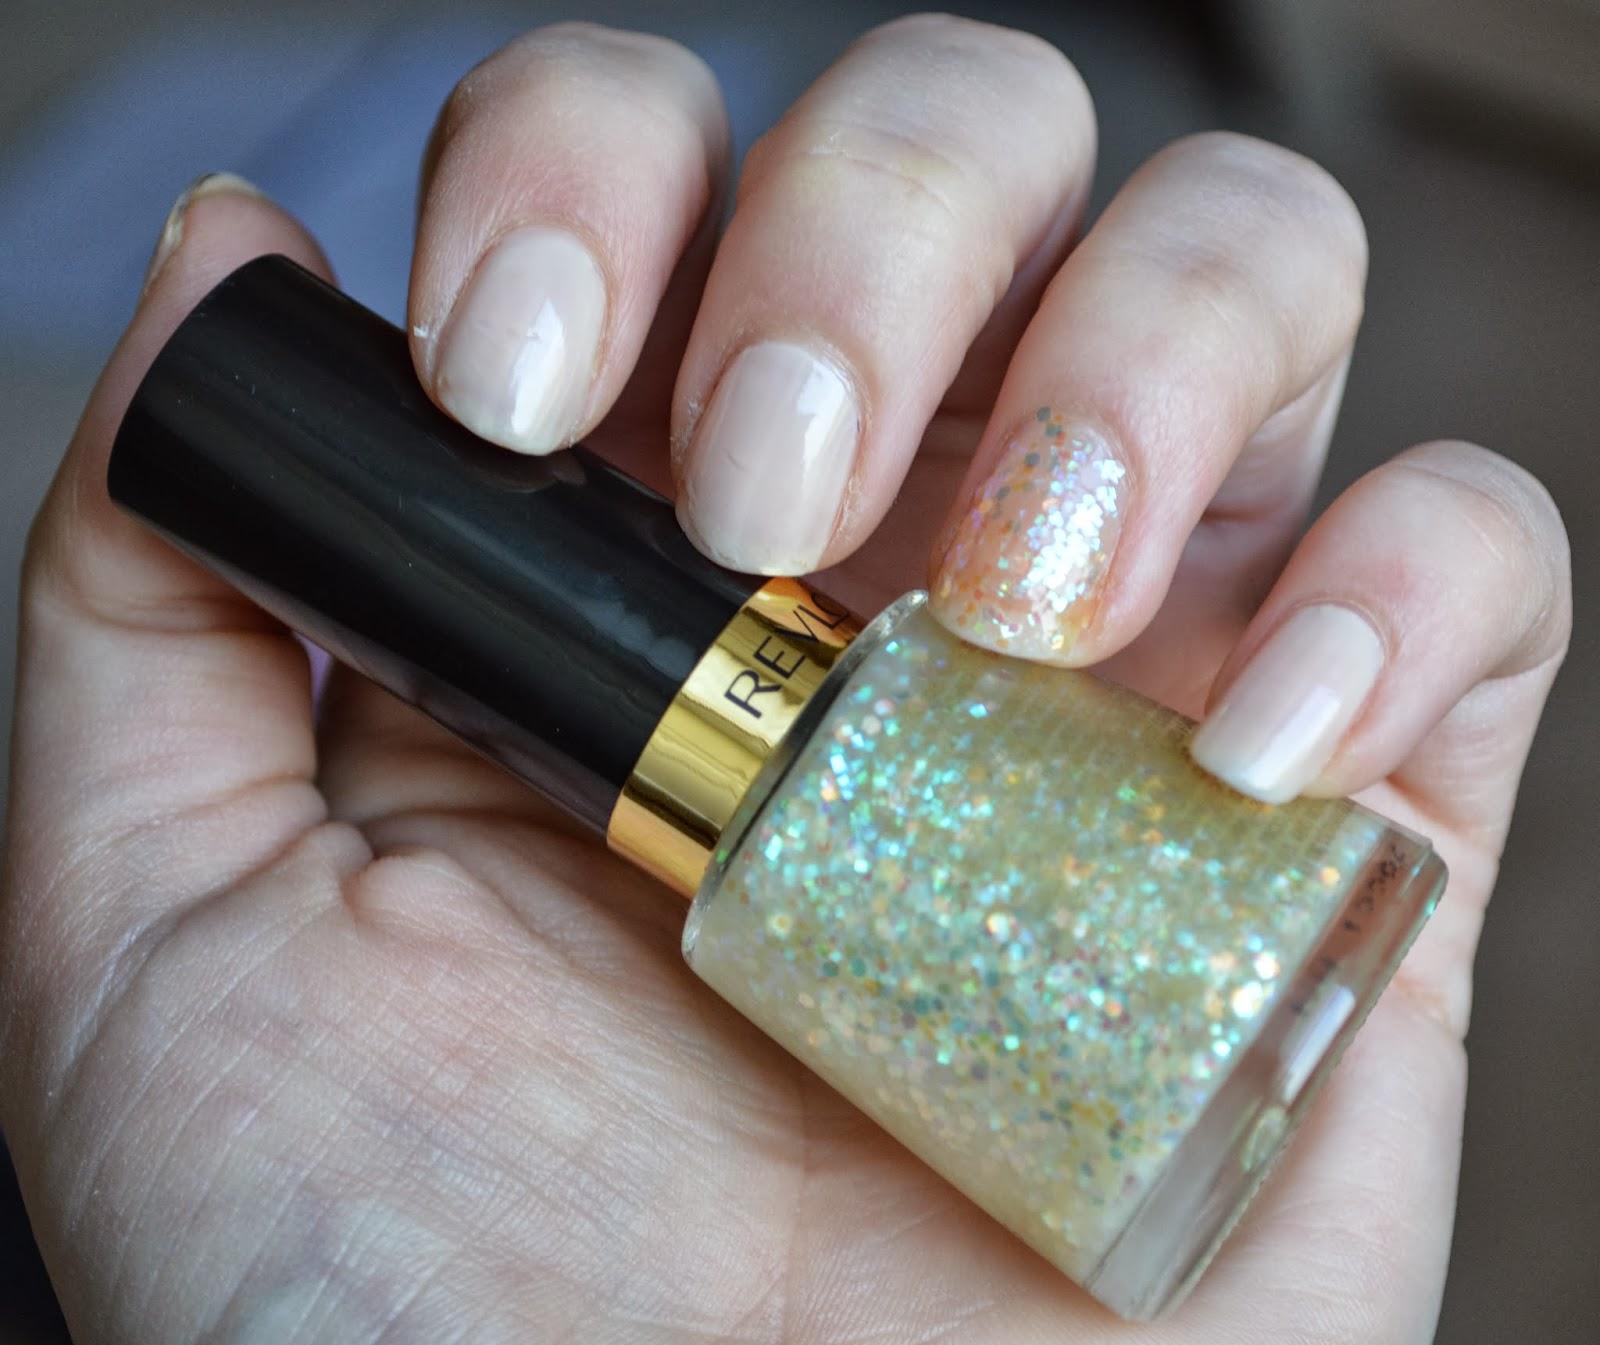 Revlon Sheer Blush Nail Enamel Review and Swatches